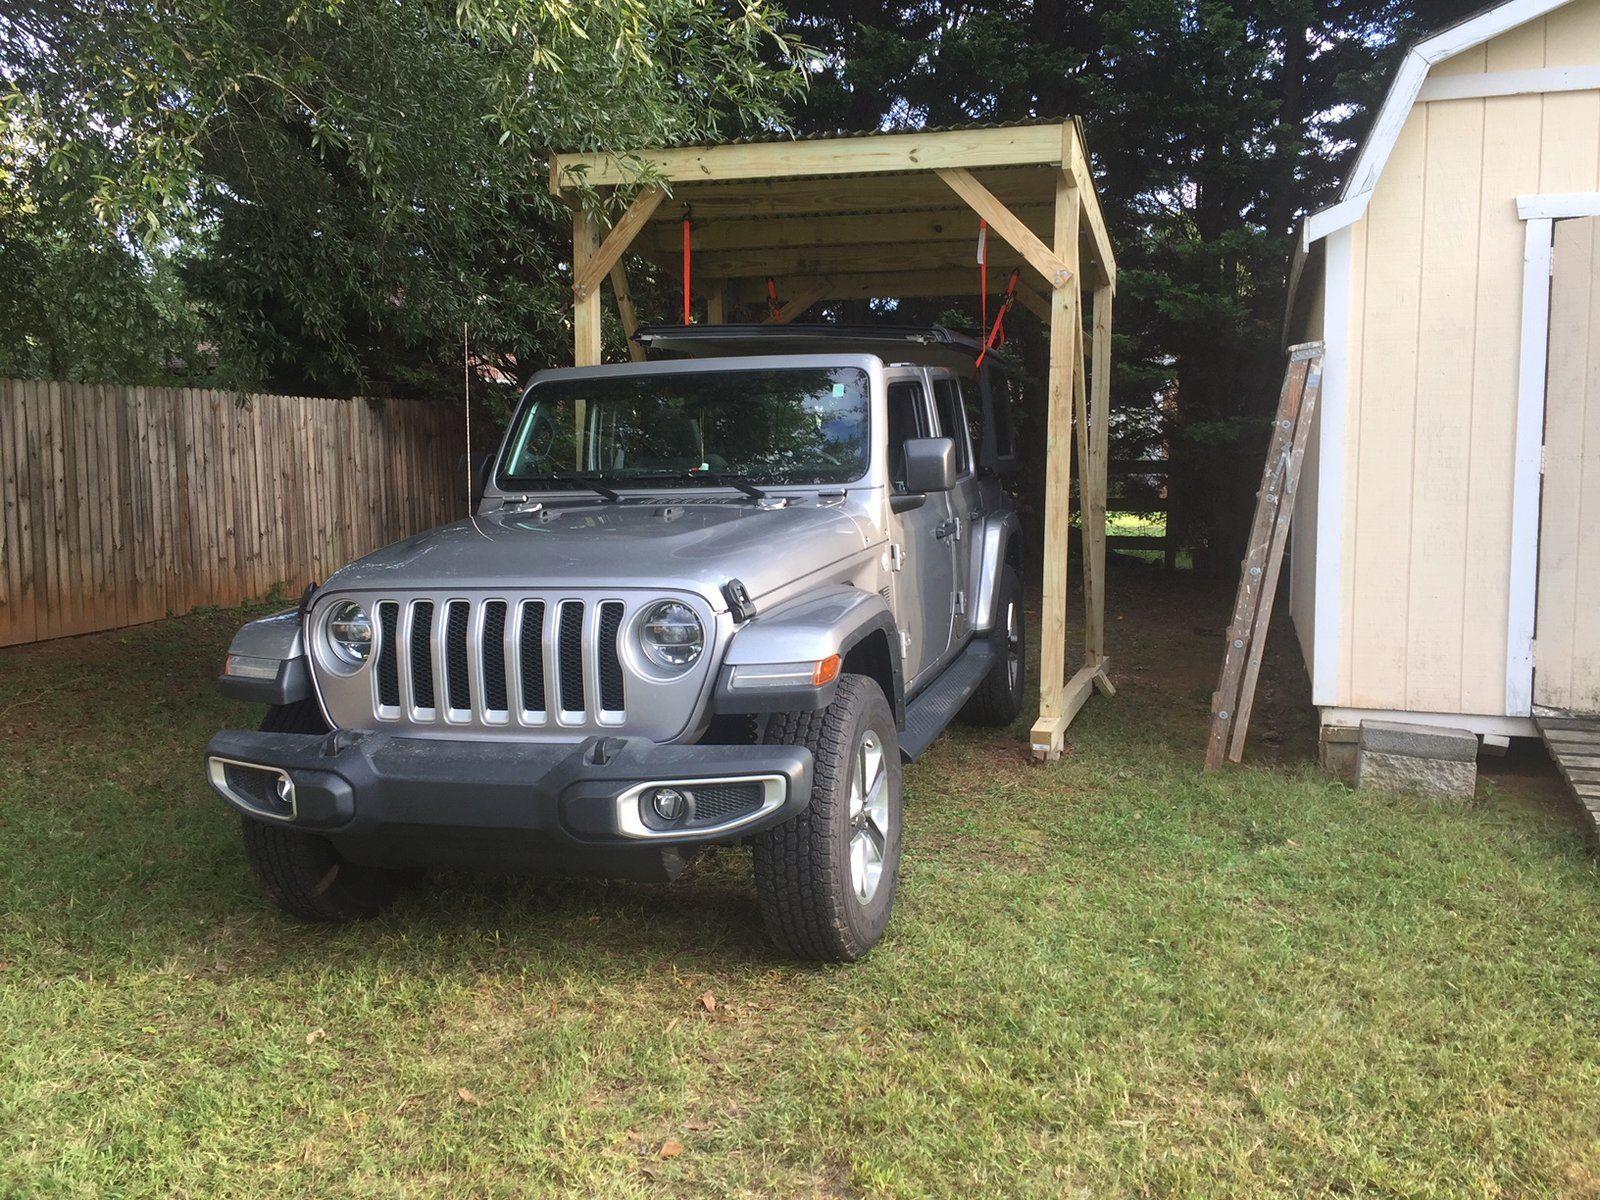 DIY Hardtop hoist ideas brainstorming Bumper hitch